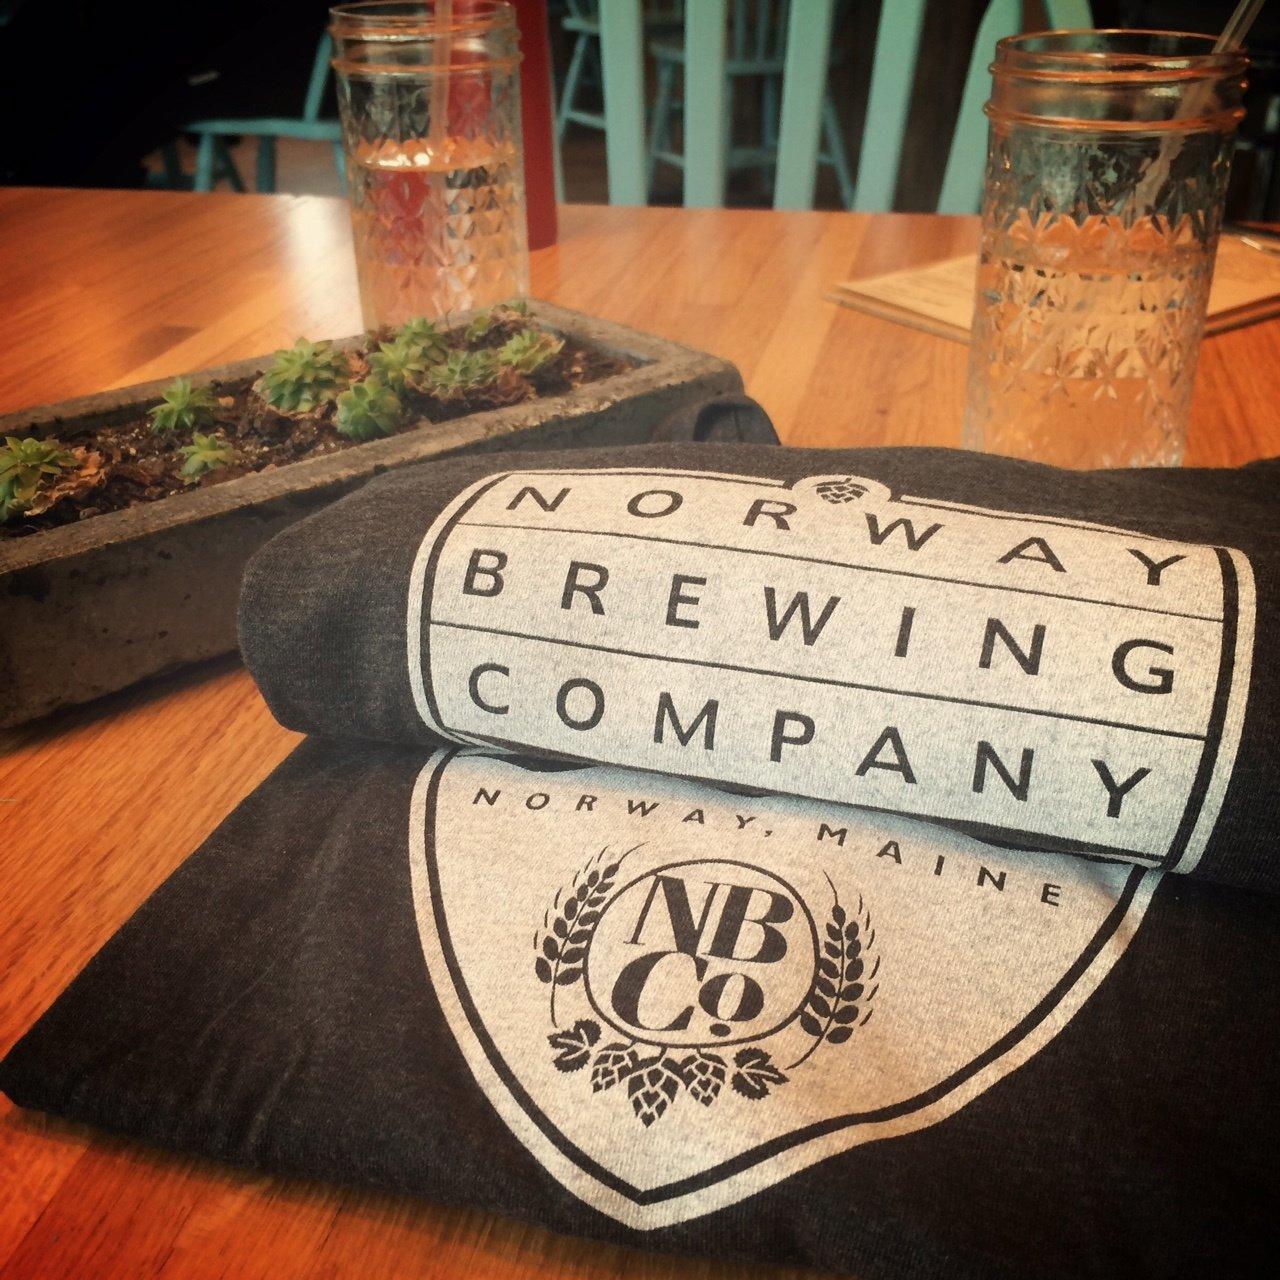 Norway Brewing Company.jpg